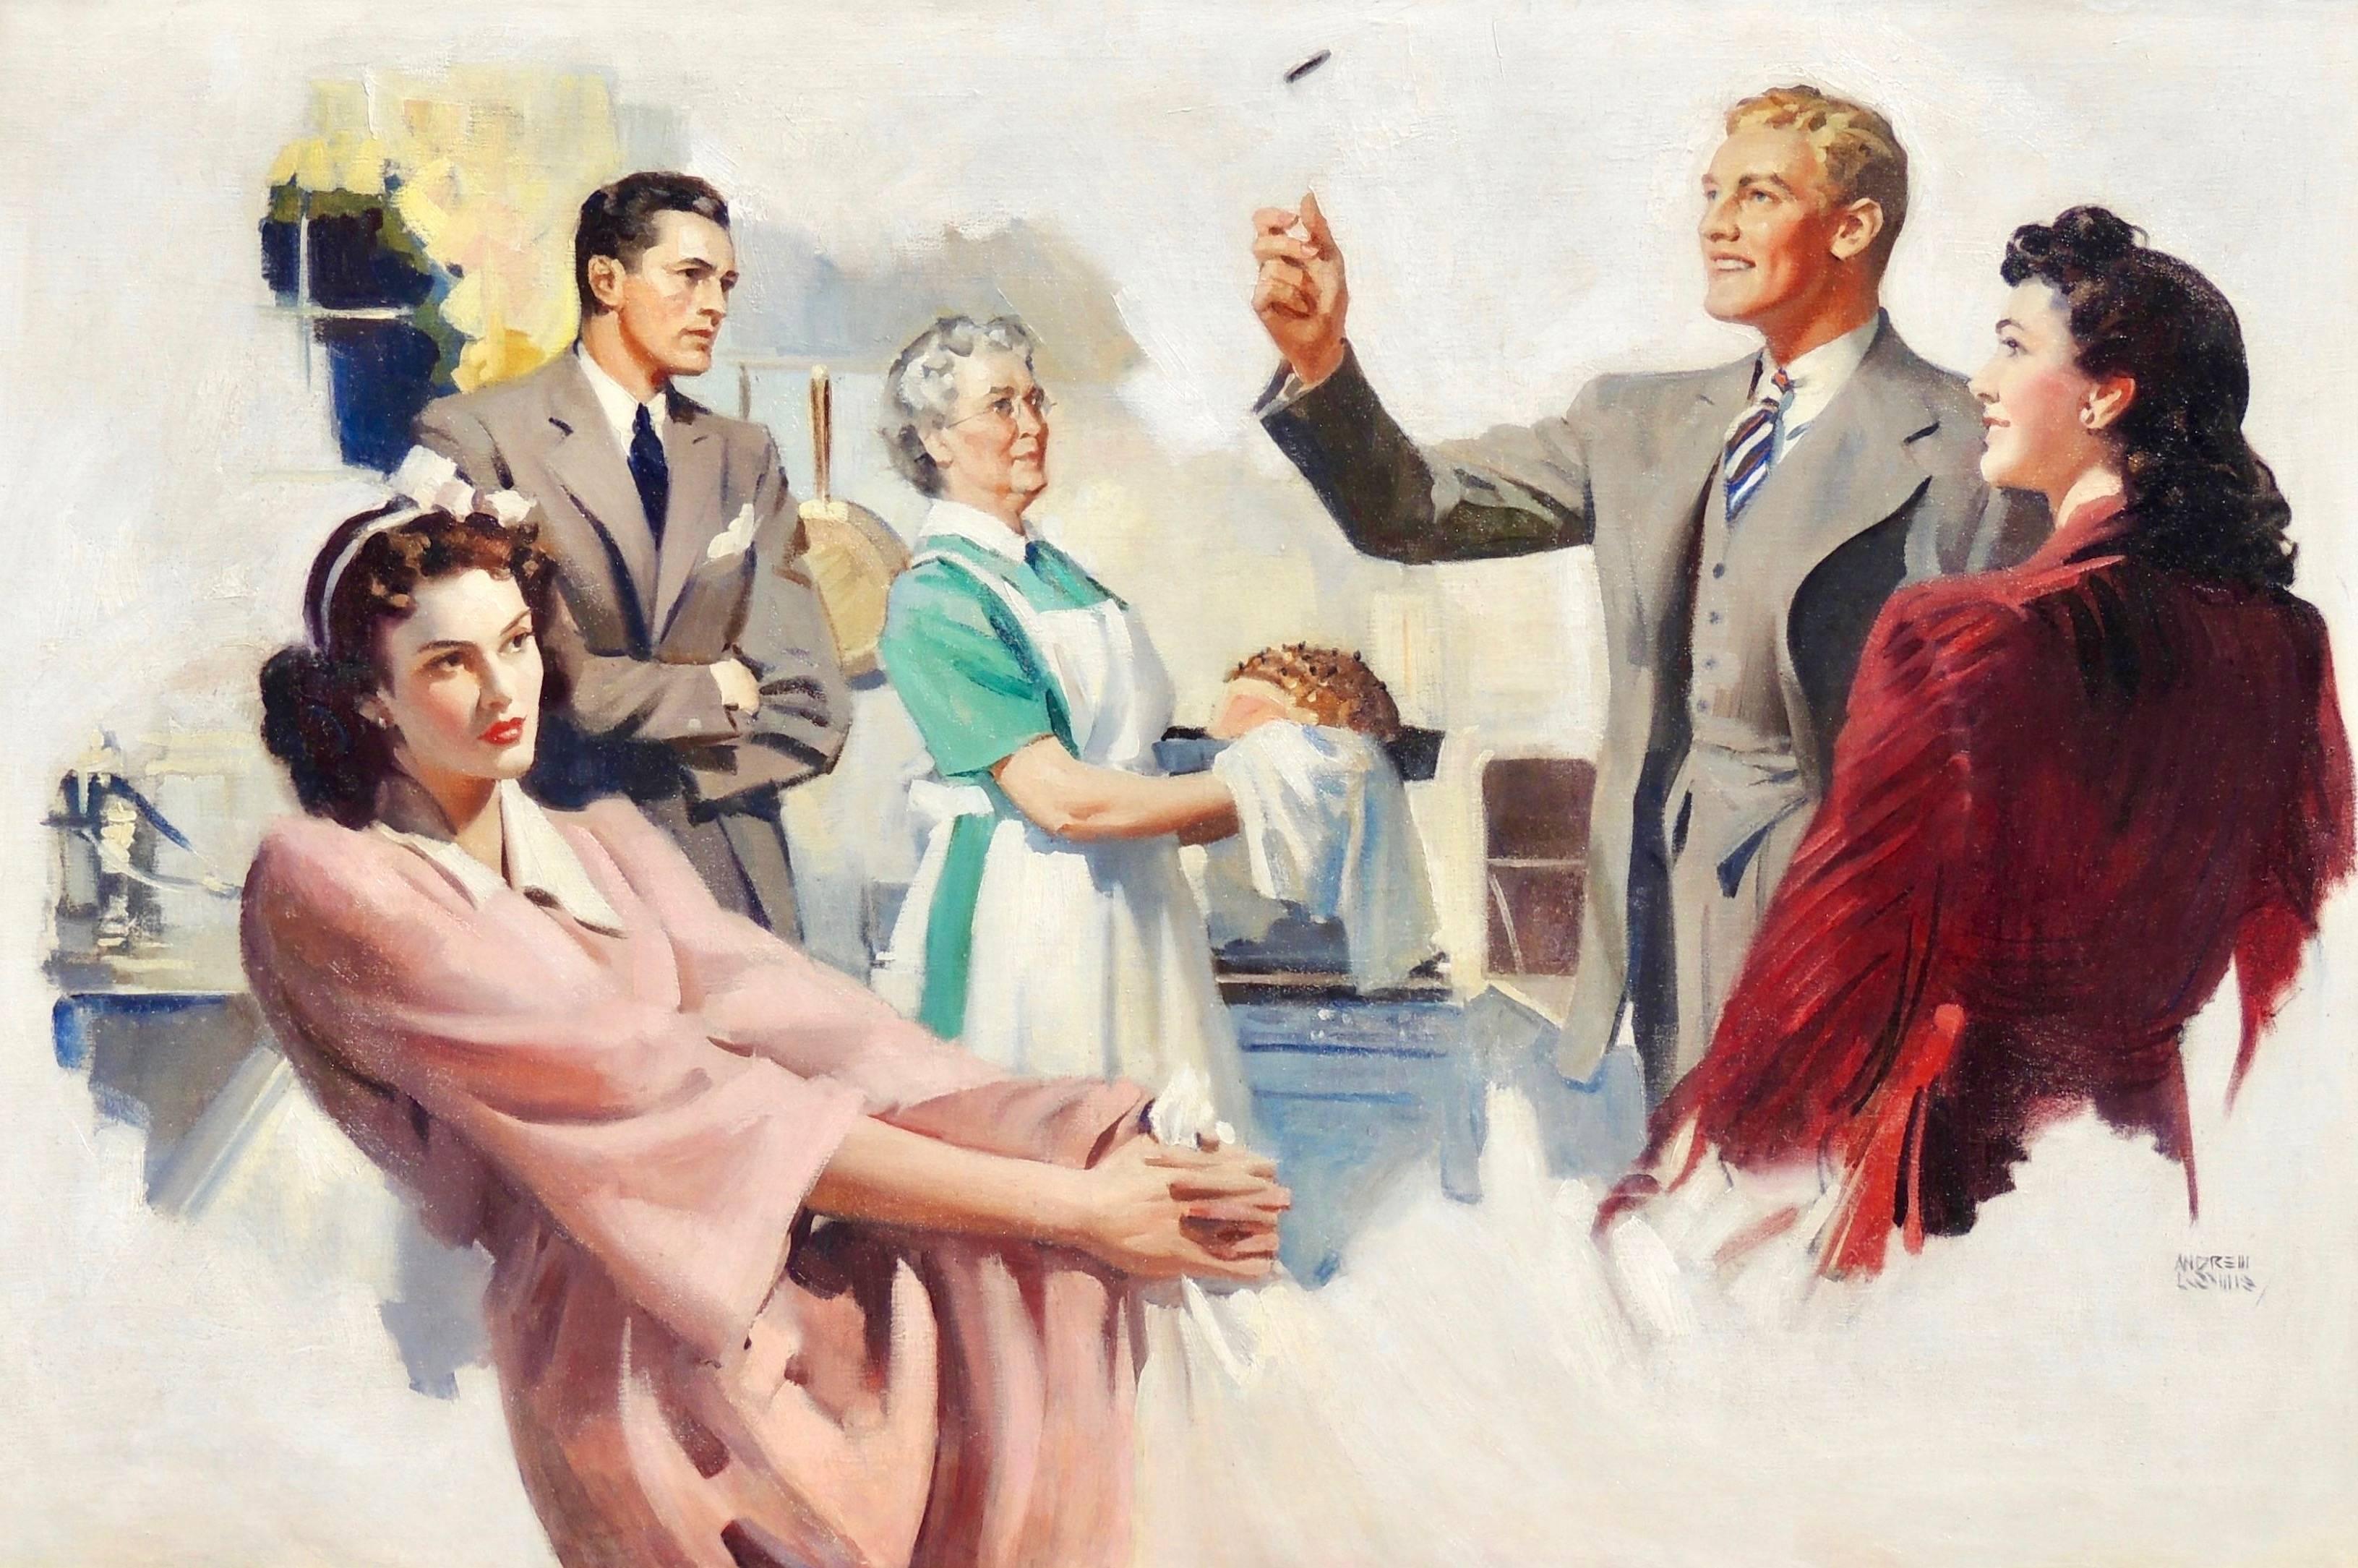 Man Flipping a Coin, Probable Interior Magazine Illustration, 1942